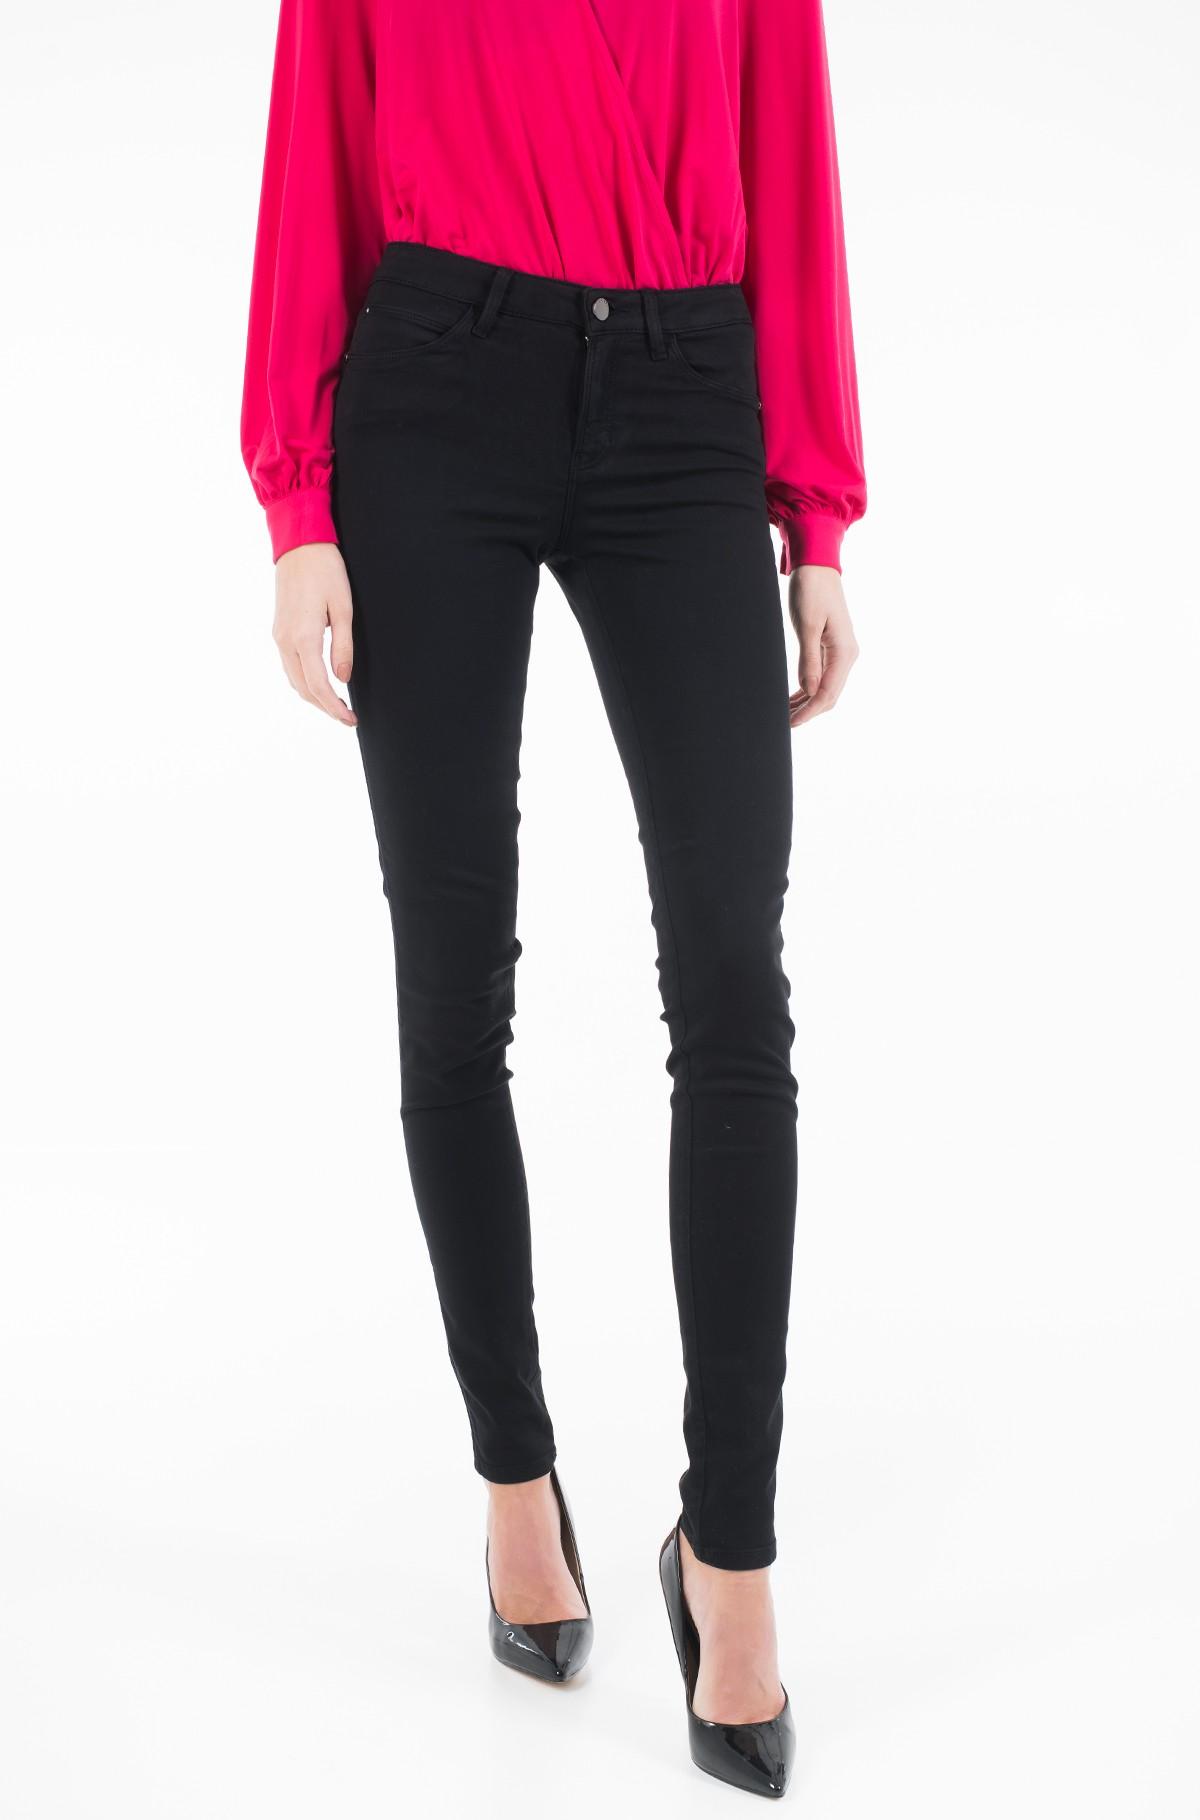 Jeans W01AJ2 W77RA-full-1